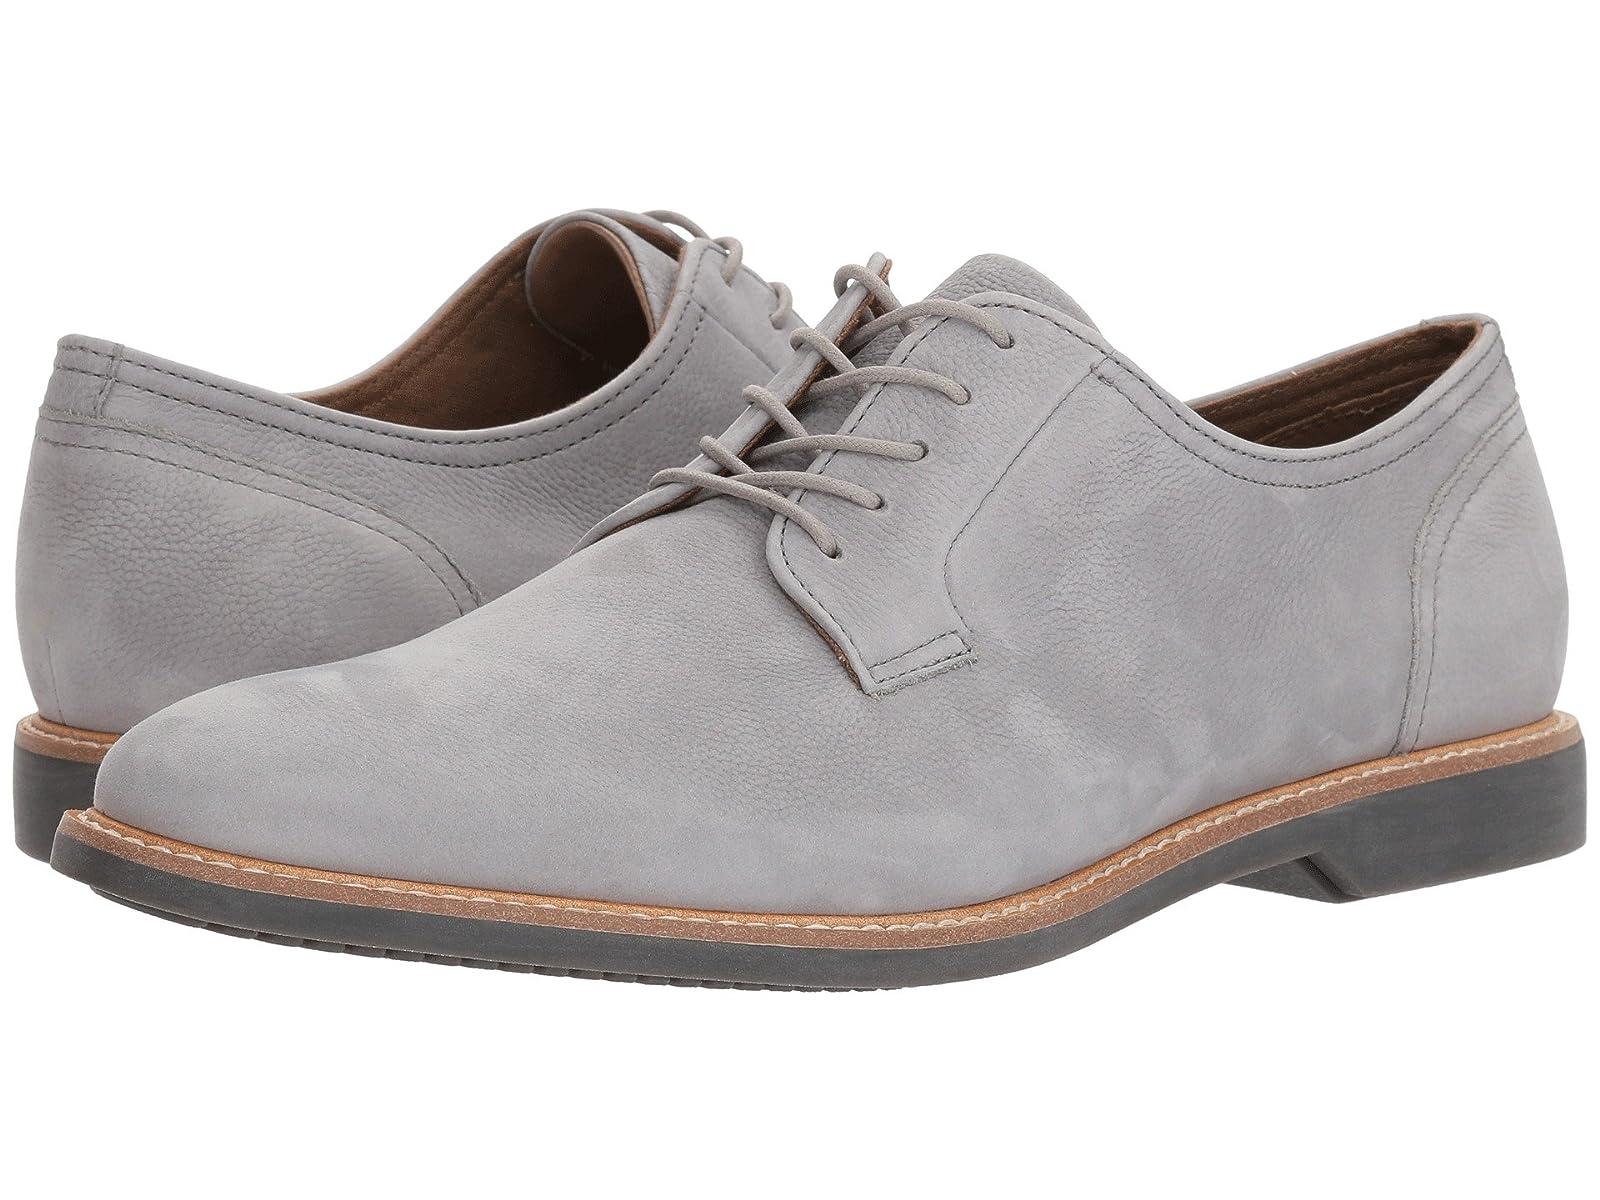 ALDO ZevielAtmospheric grades have affordable shoes